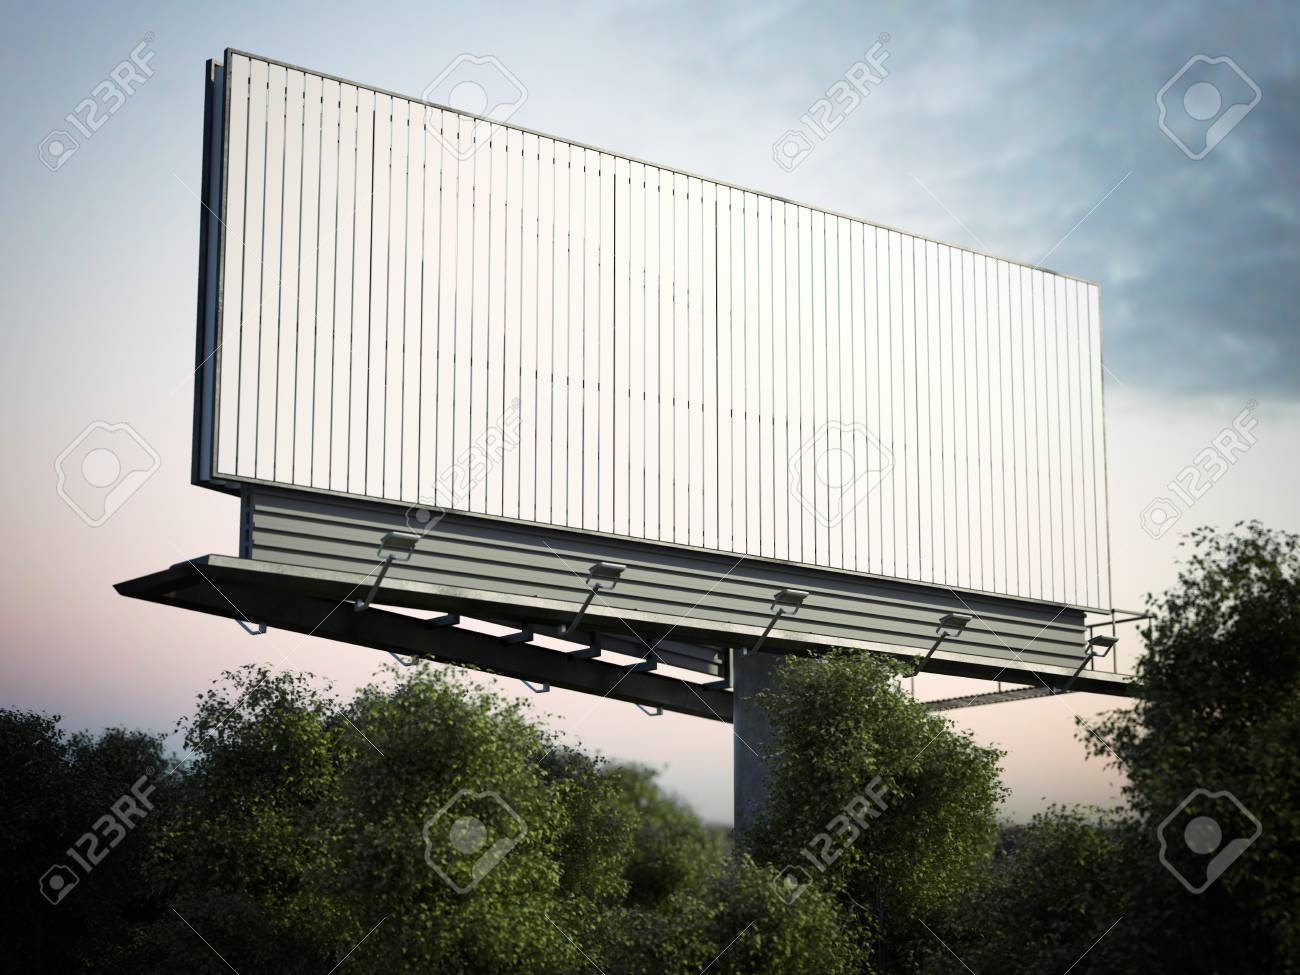 Blank outdoor advertising billboard in green trees. 3d rendering - 72461970